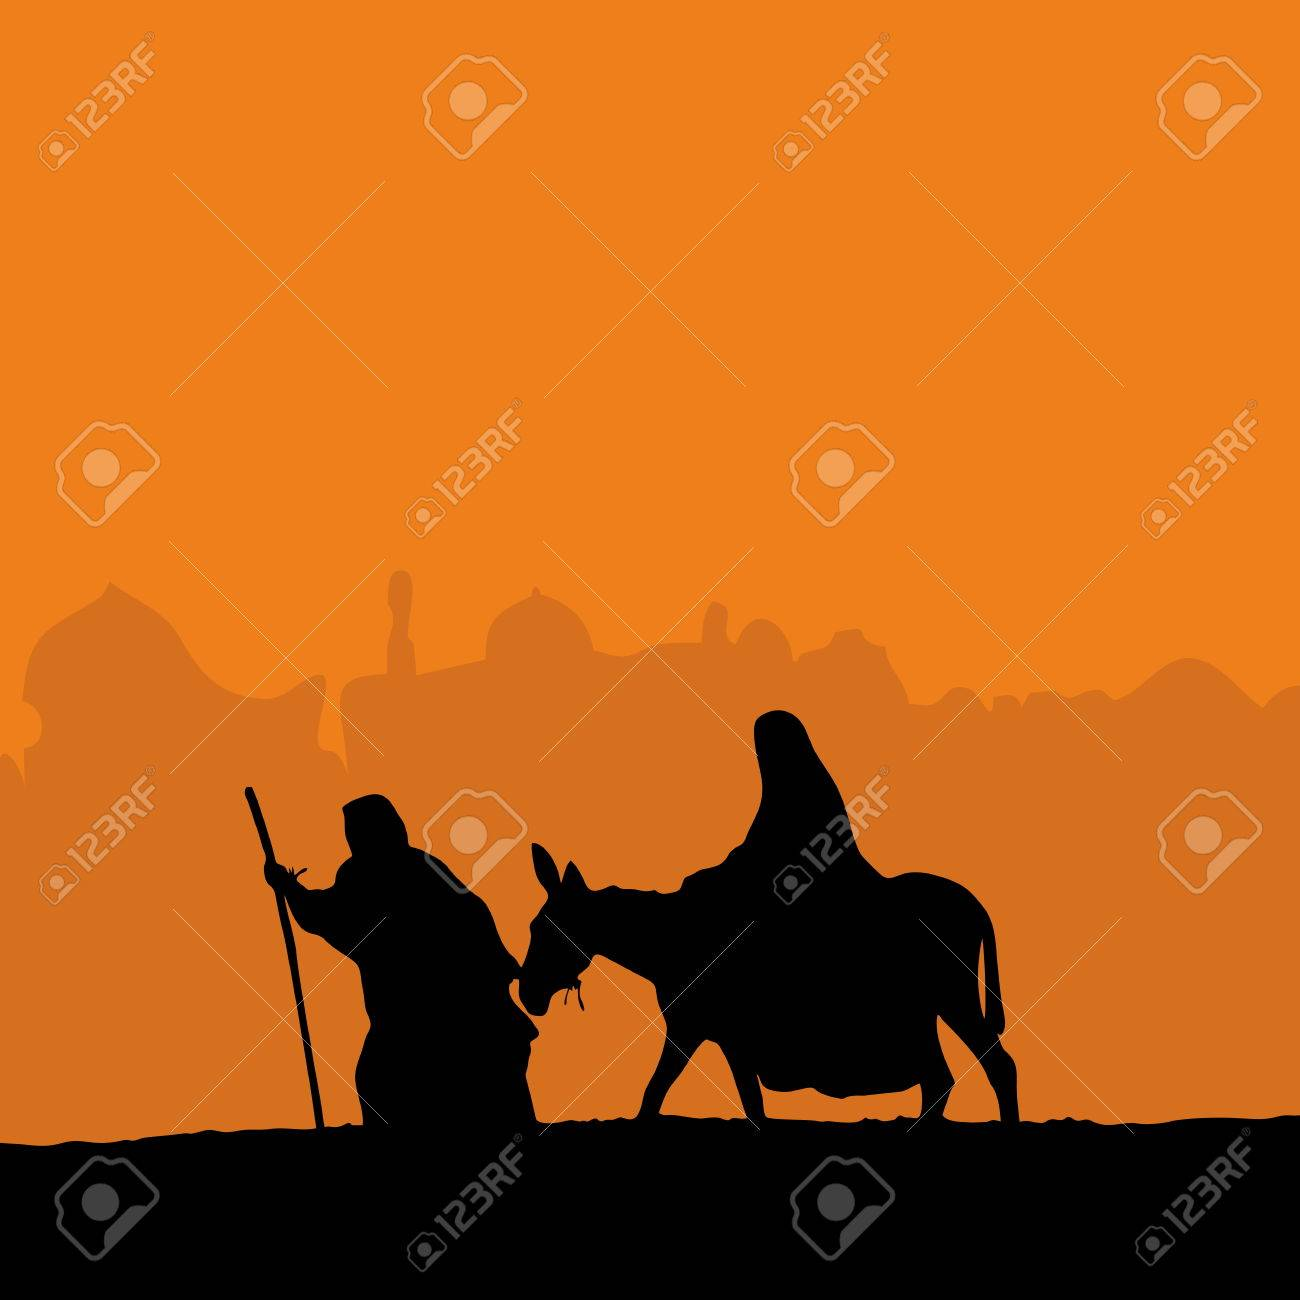 Joseph leading Mary on a donkey - 46672122